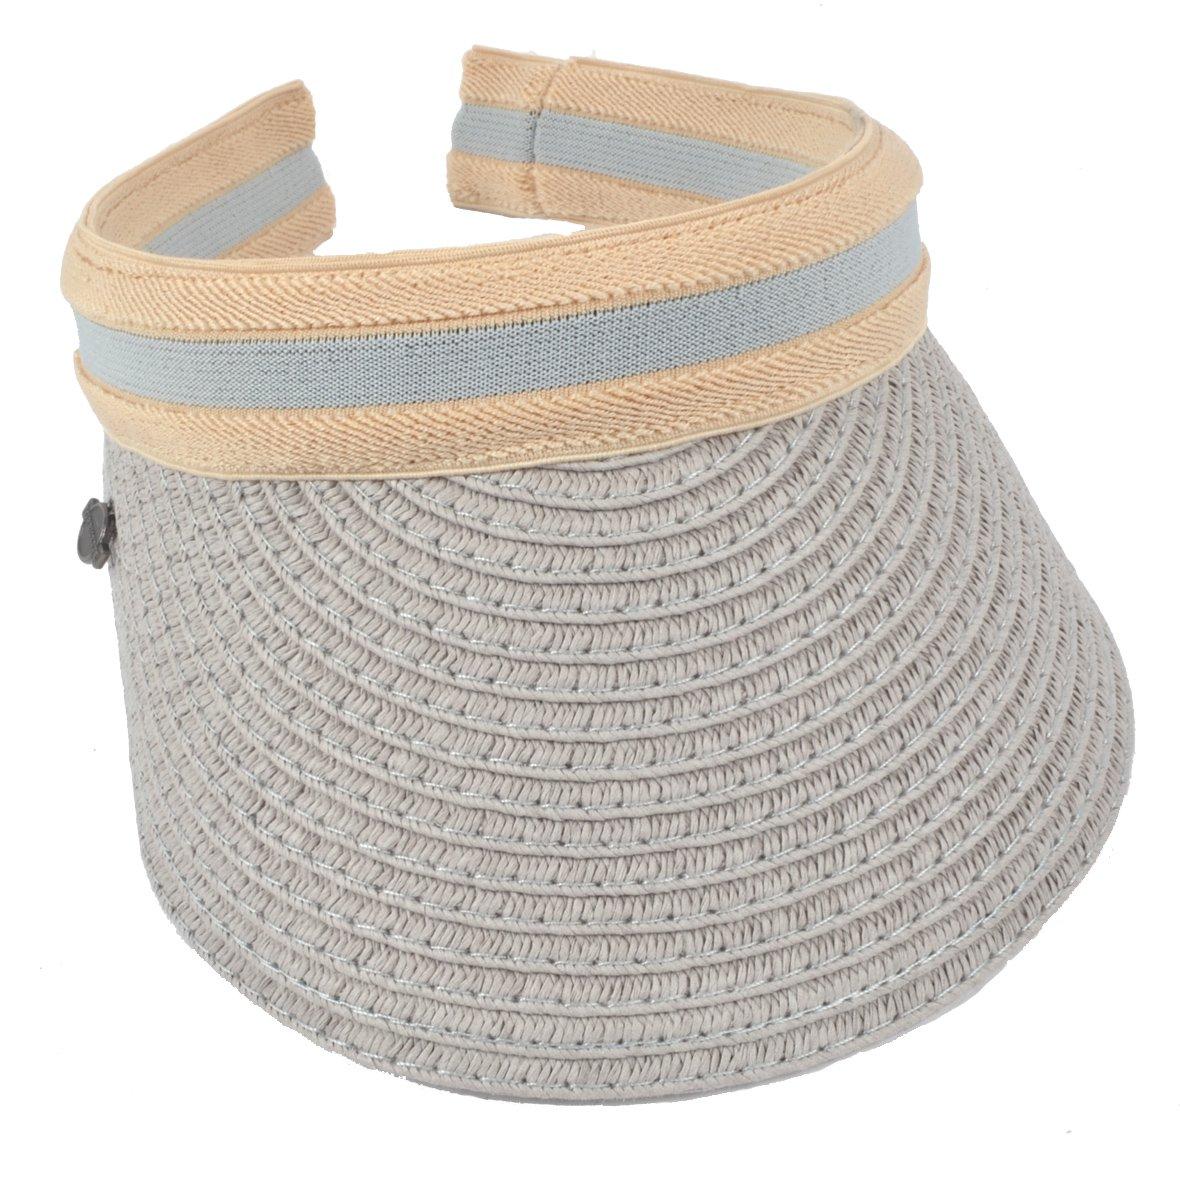 Women Sun Straw Visor Hat UV Protection Golf Beach Outdoor Sports Summer Hat V201 (Grey)